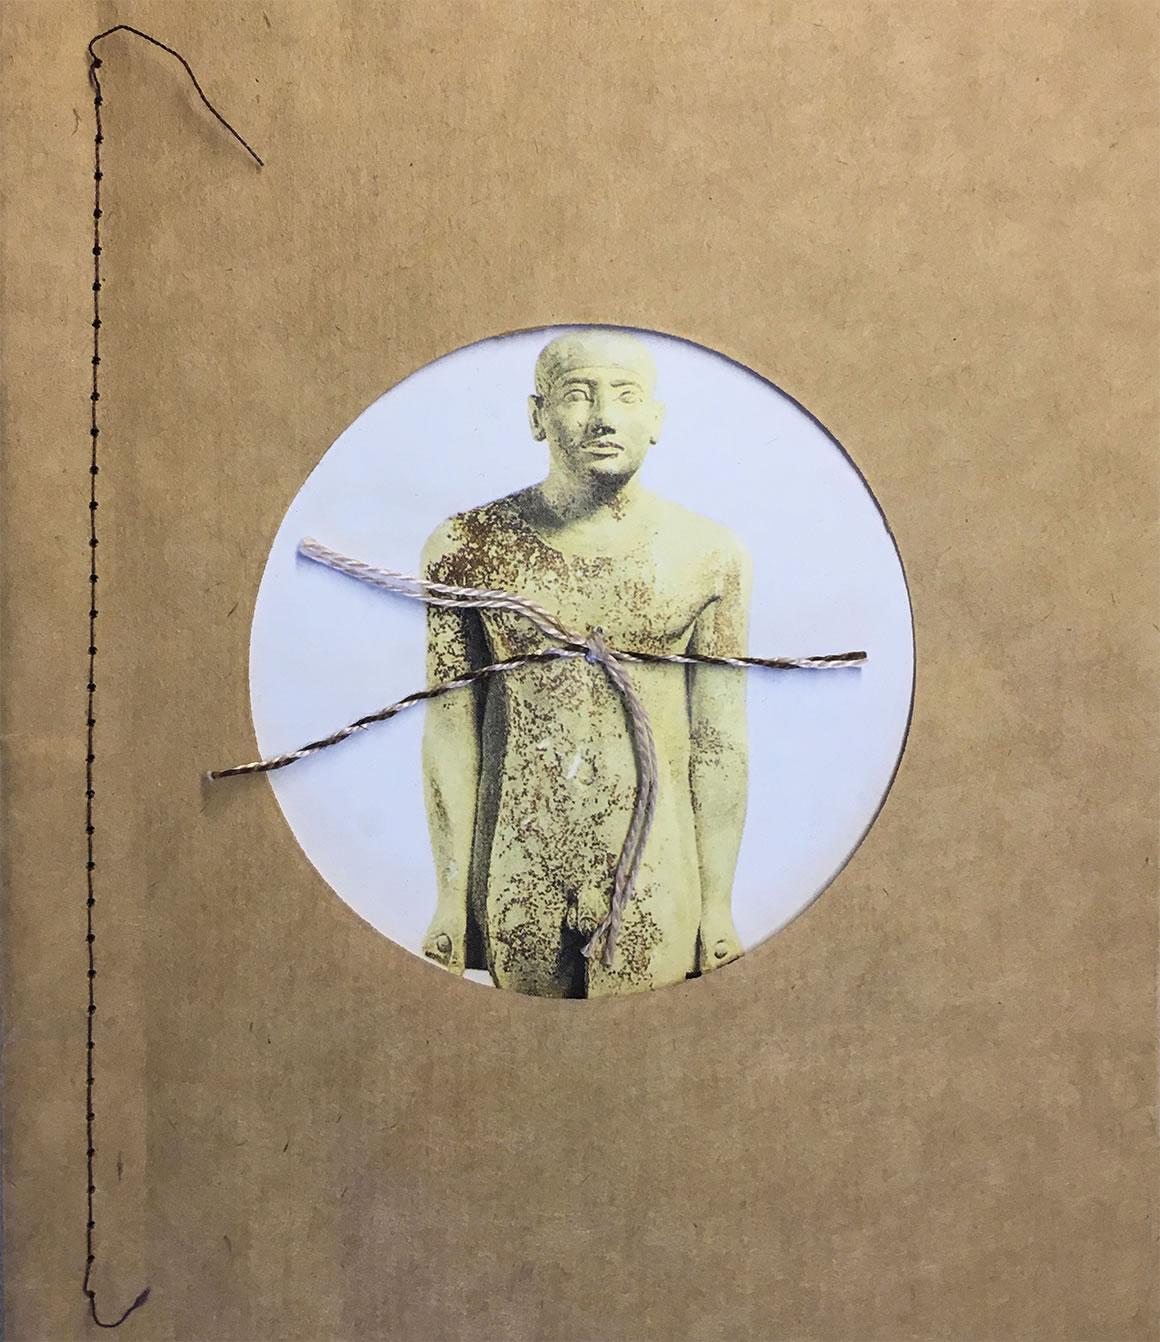 nagada-egypt-clothes-cairo-history.jpg